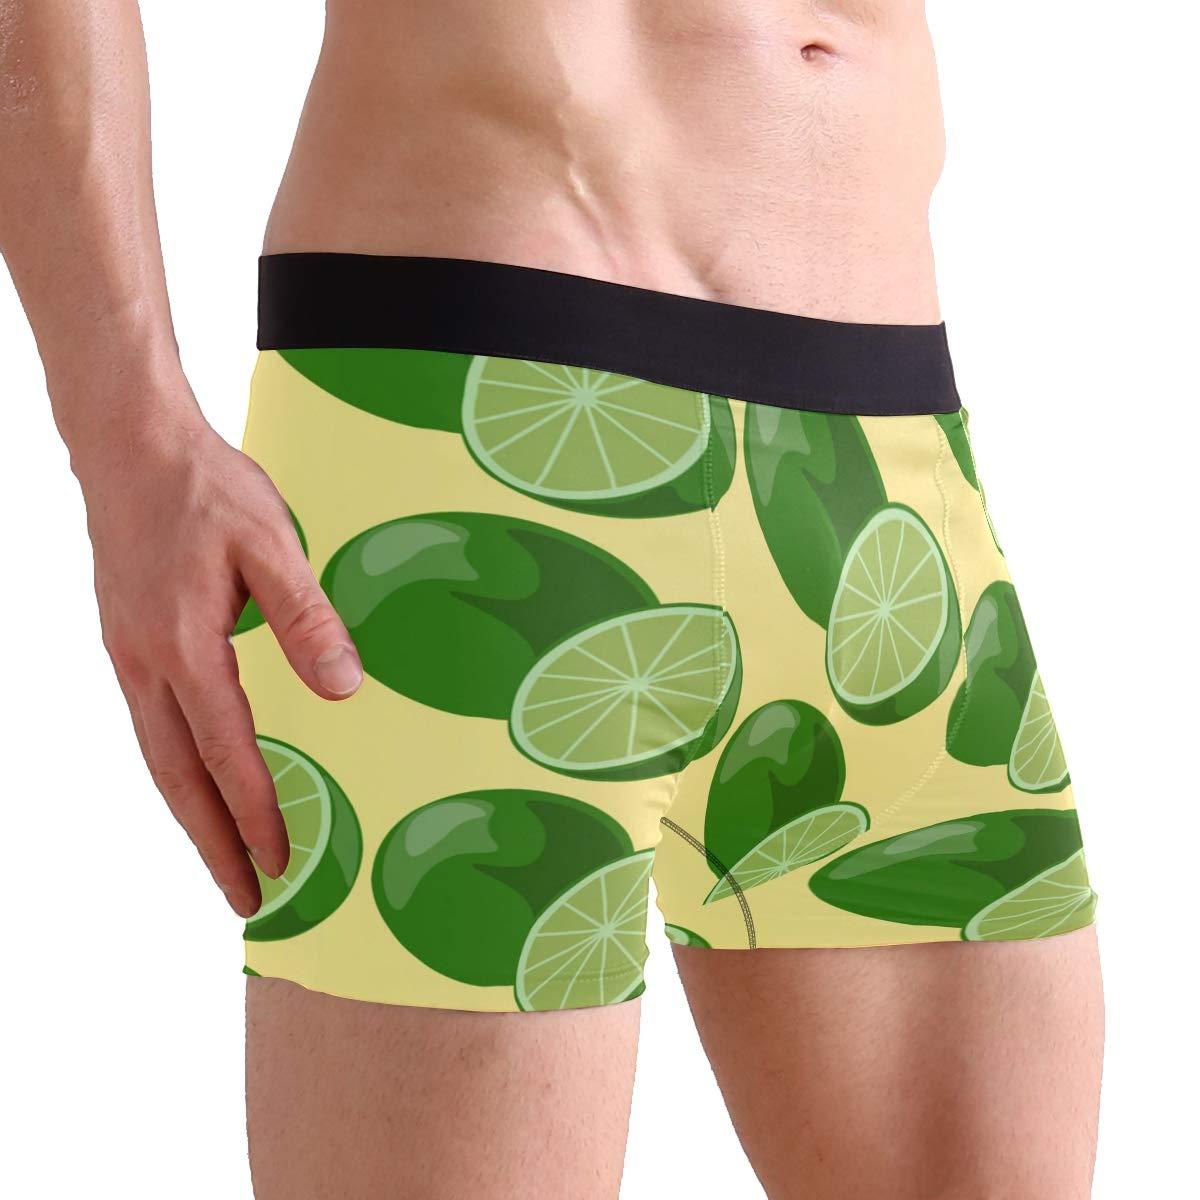 Hipster Unique Lime Sketch Limes Citrus GreenBoxer Briefs Mens Underwear Boys Breathable Stretch Low Rise